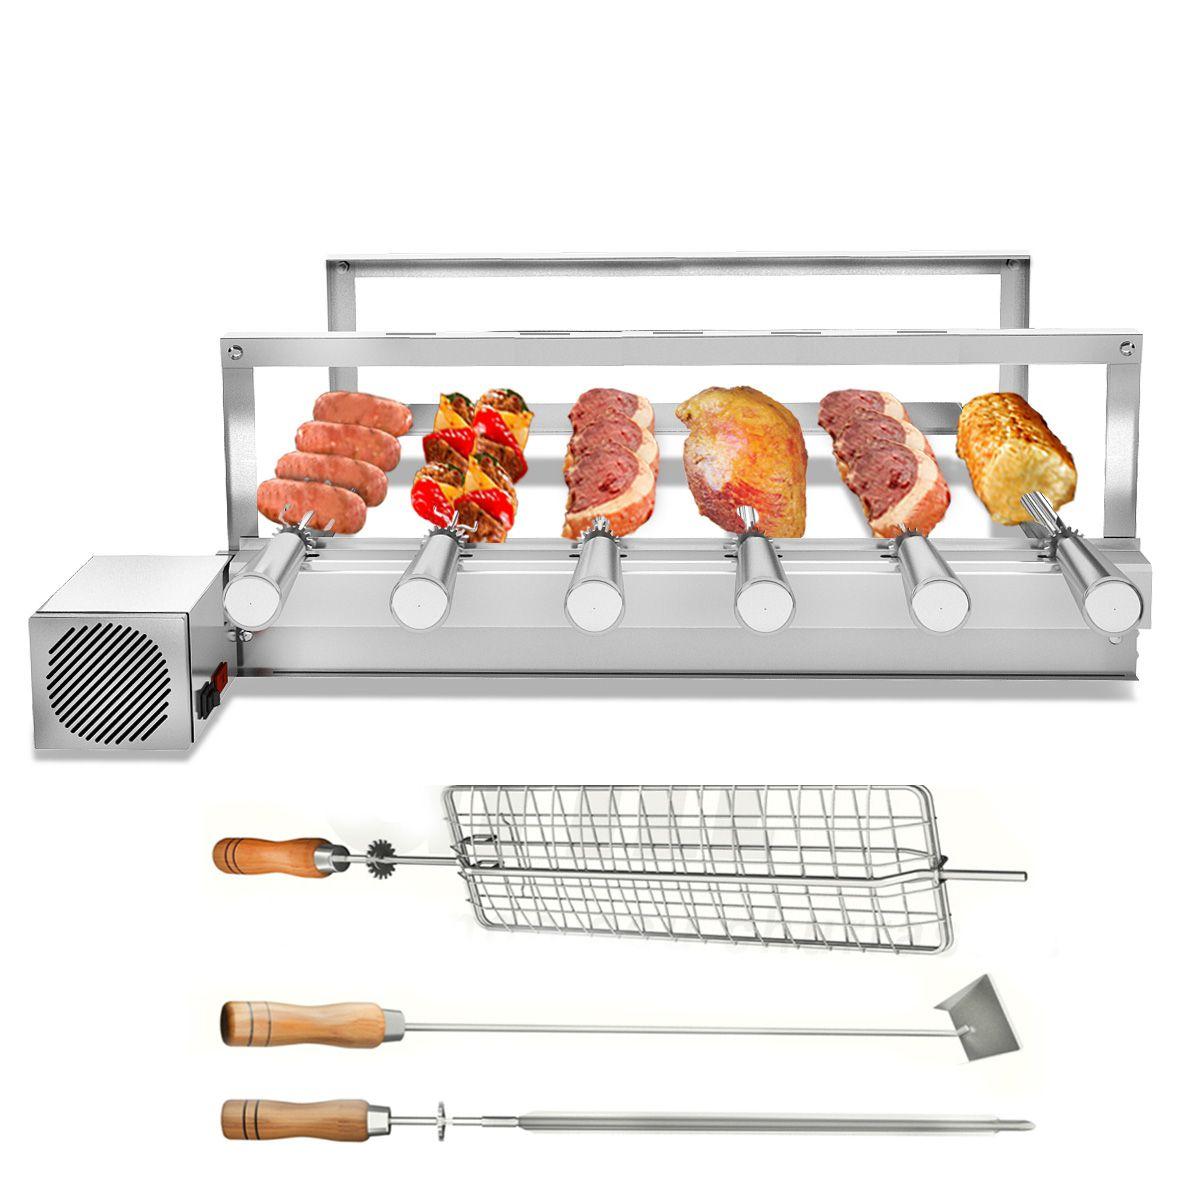 Churrasqueira Gira Grill Inox 6 Espetos Giratórios + 3 Acessórios Inclusos